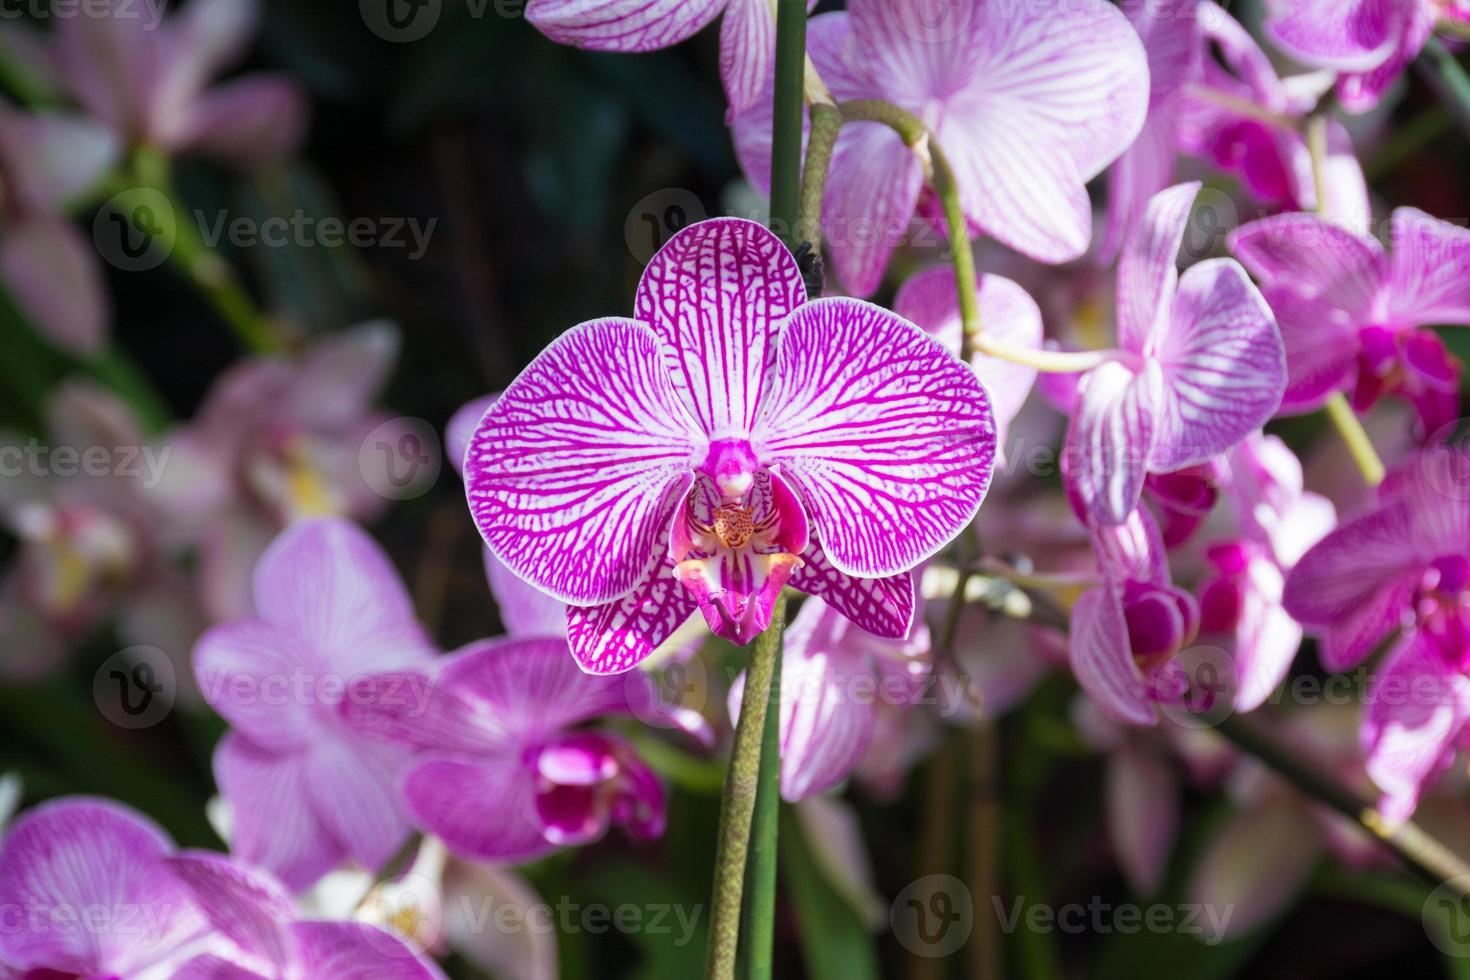 Rosa Orchideen bei der Orchideenshow, botanischer Garten von New York foto